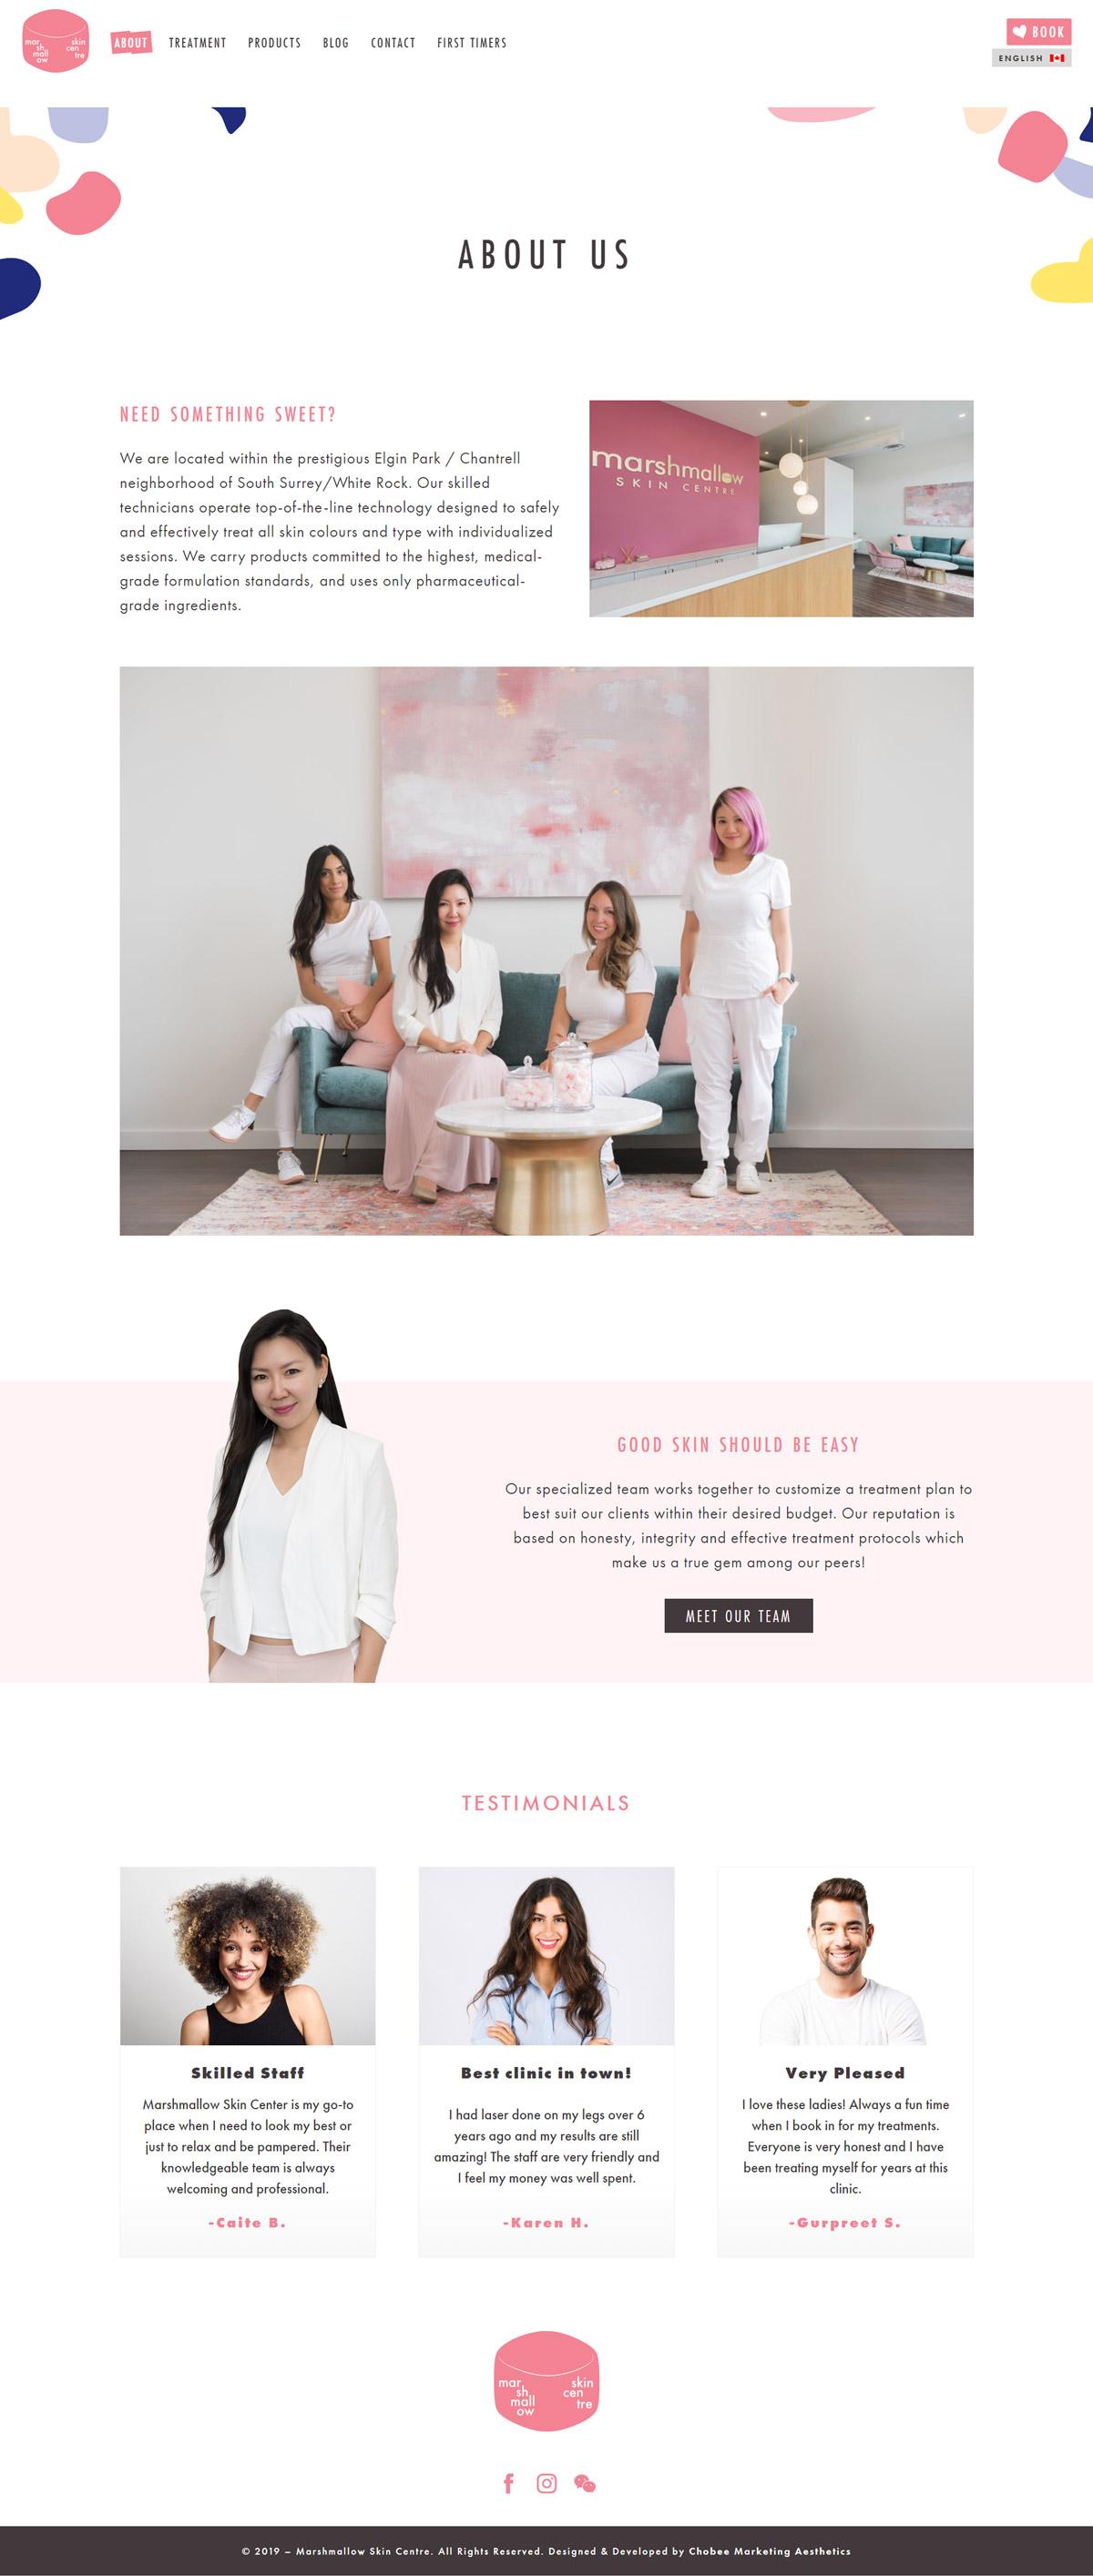 Marshmallow Skincare Centre Website Development